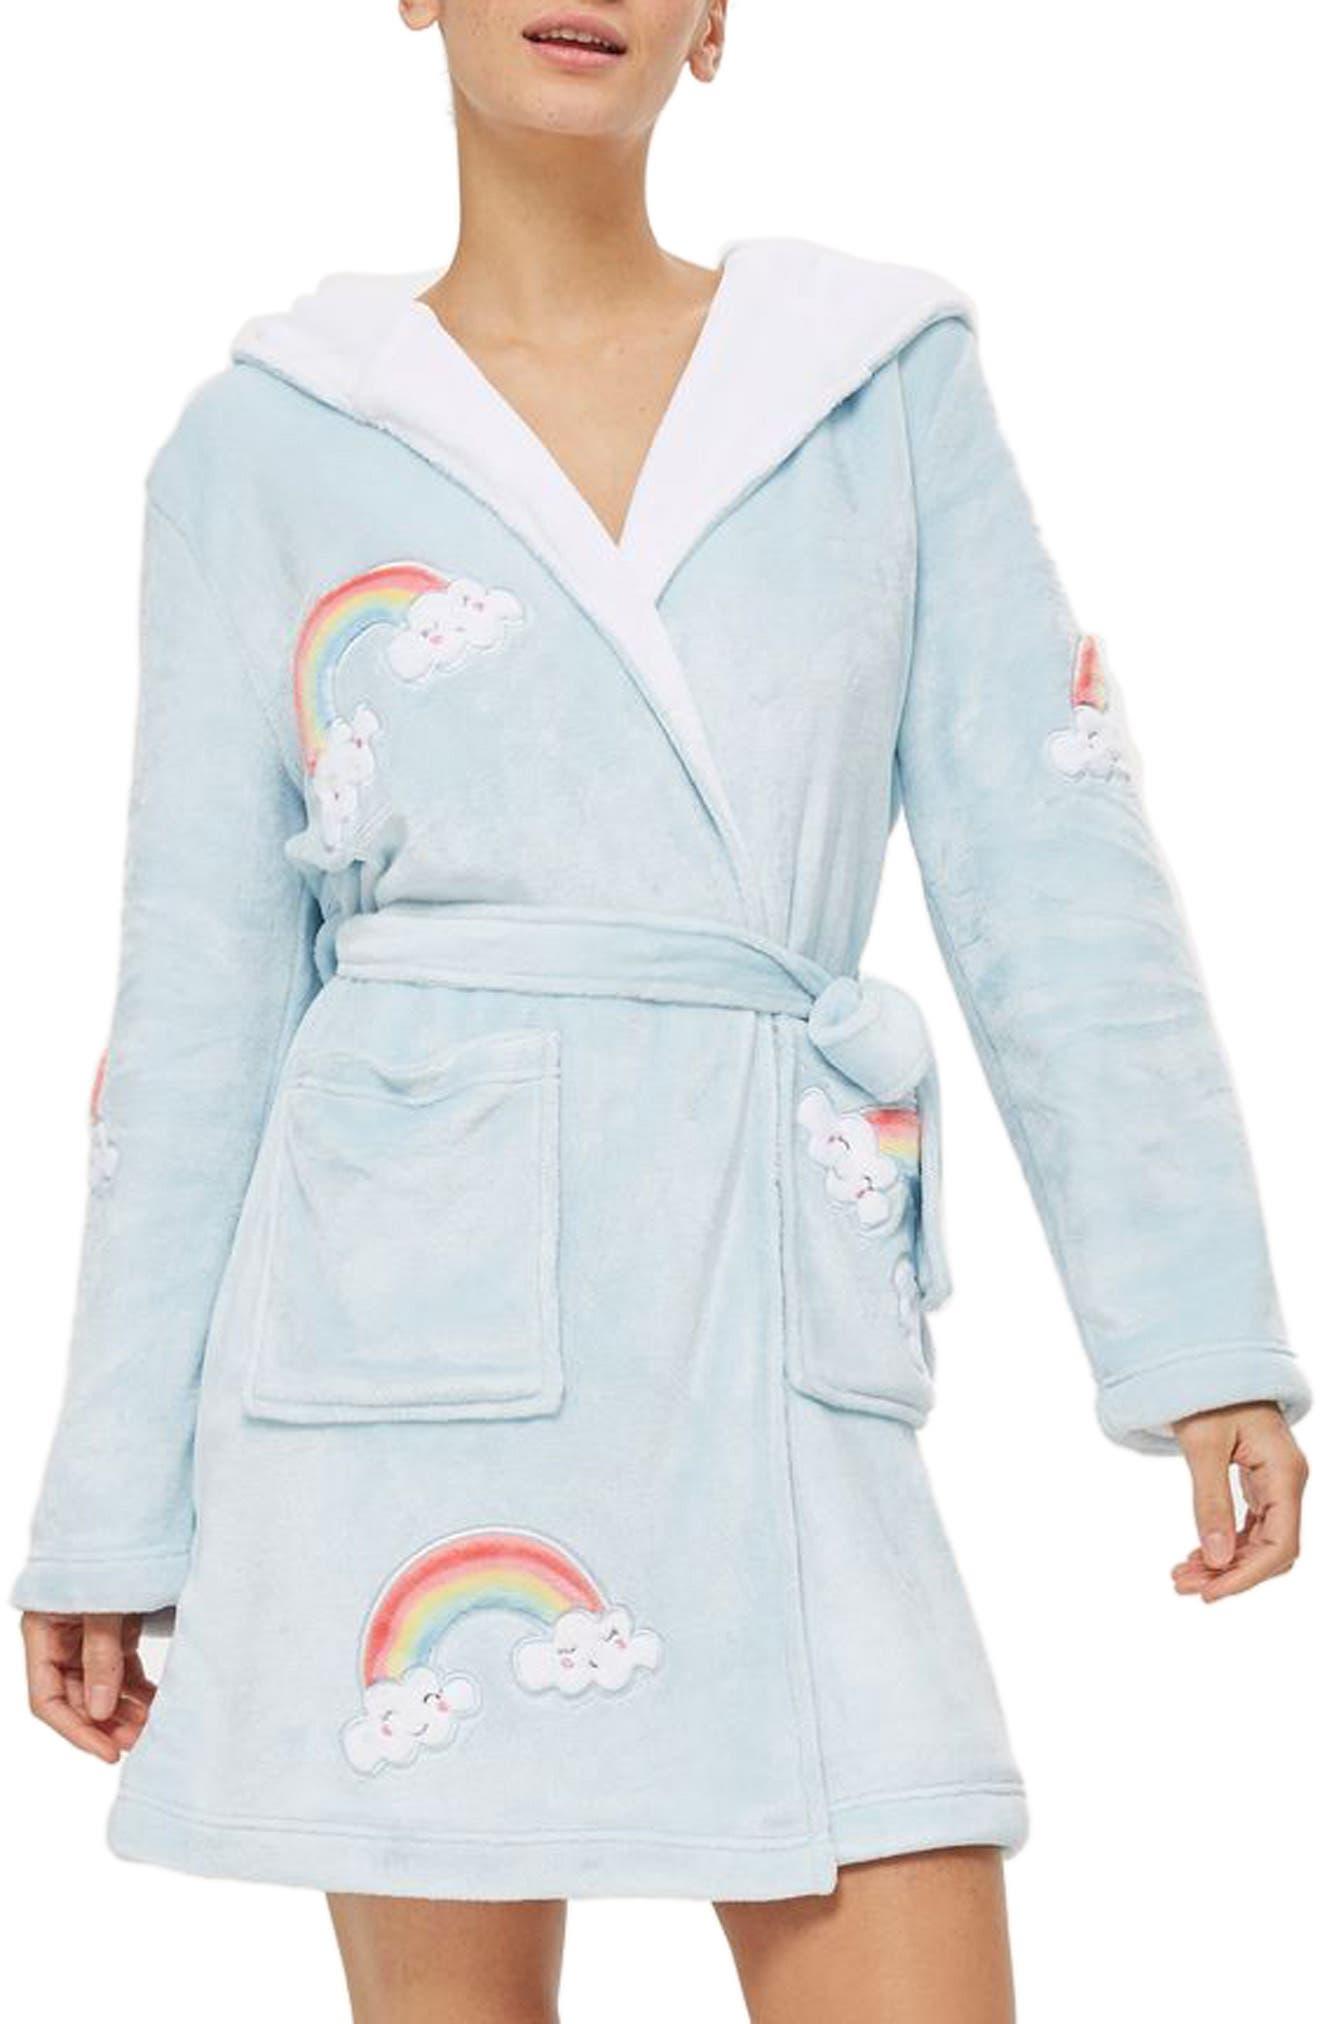 Rainbow Dressing Robe,                             Main thumbnail 1, color,                             450